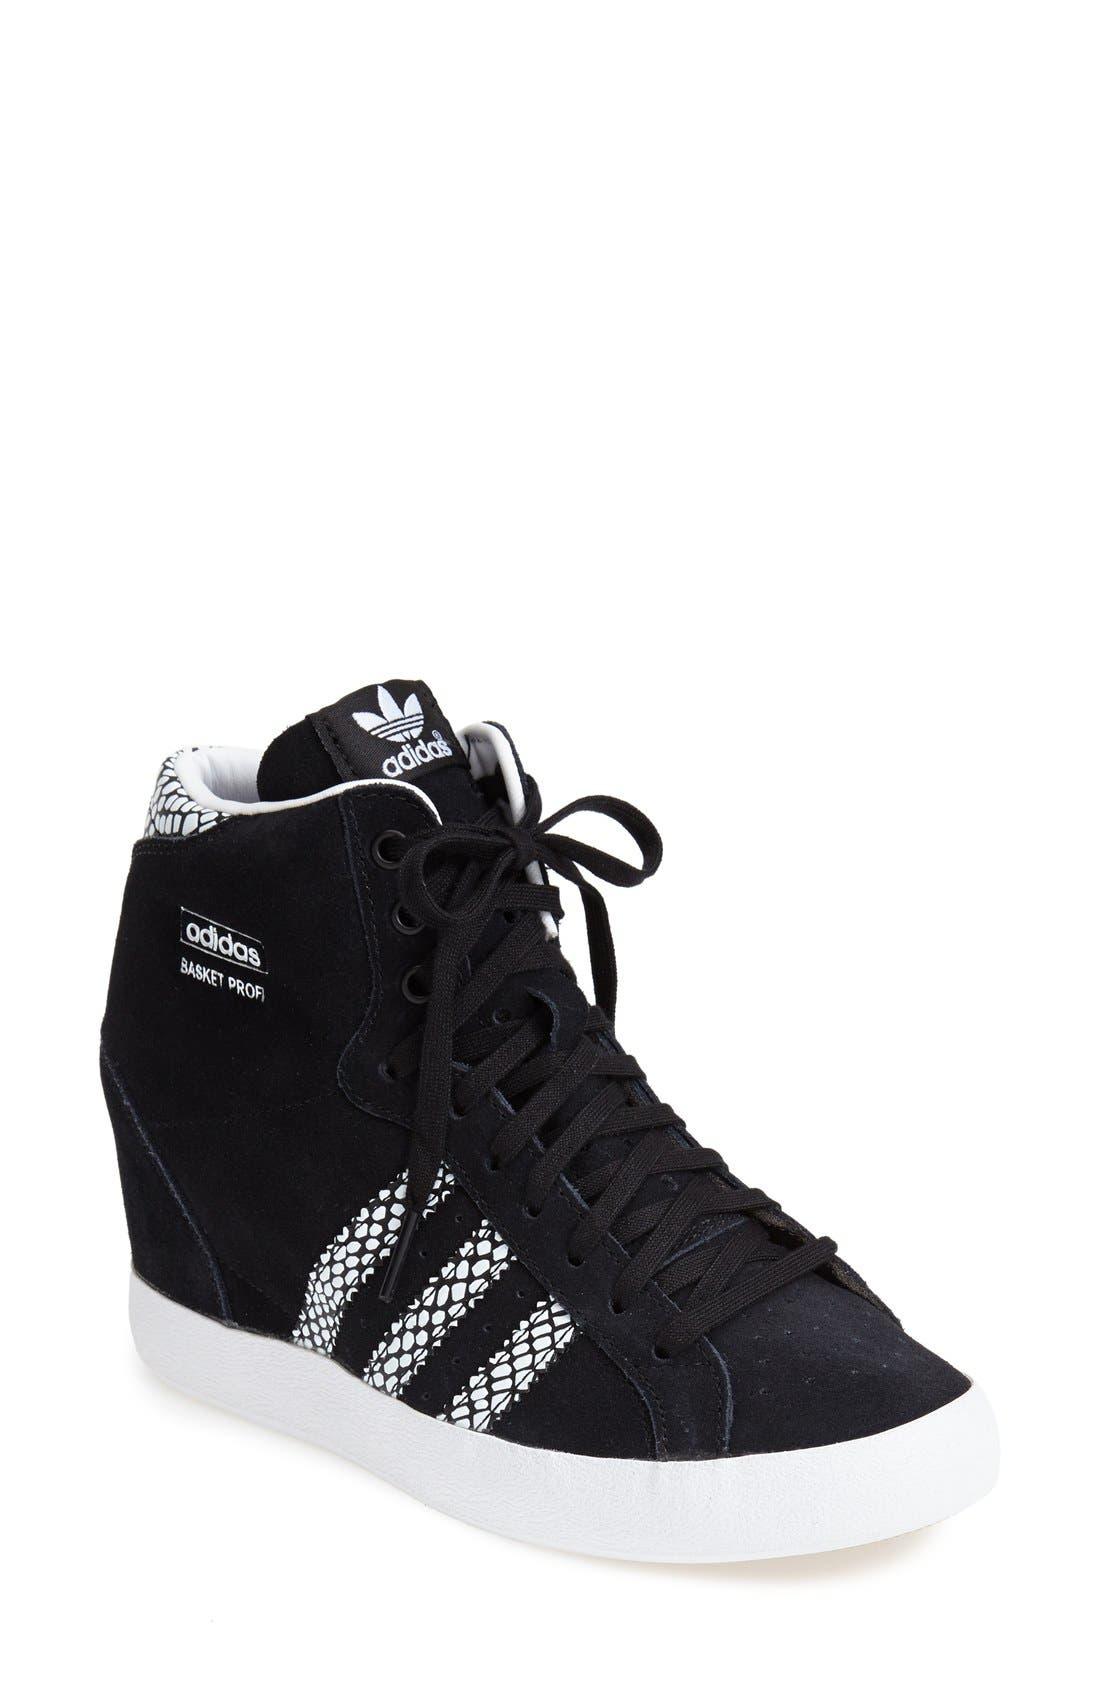 Alternate Image 1 Selected - adidas Hidden Wedge Sneaker (Women)